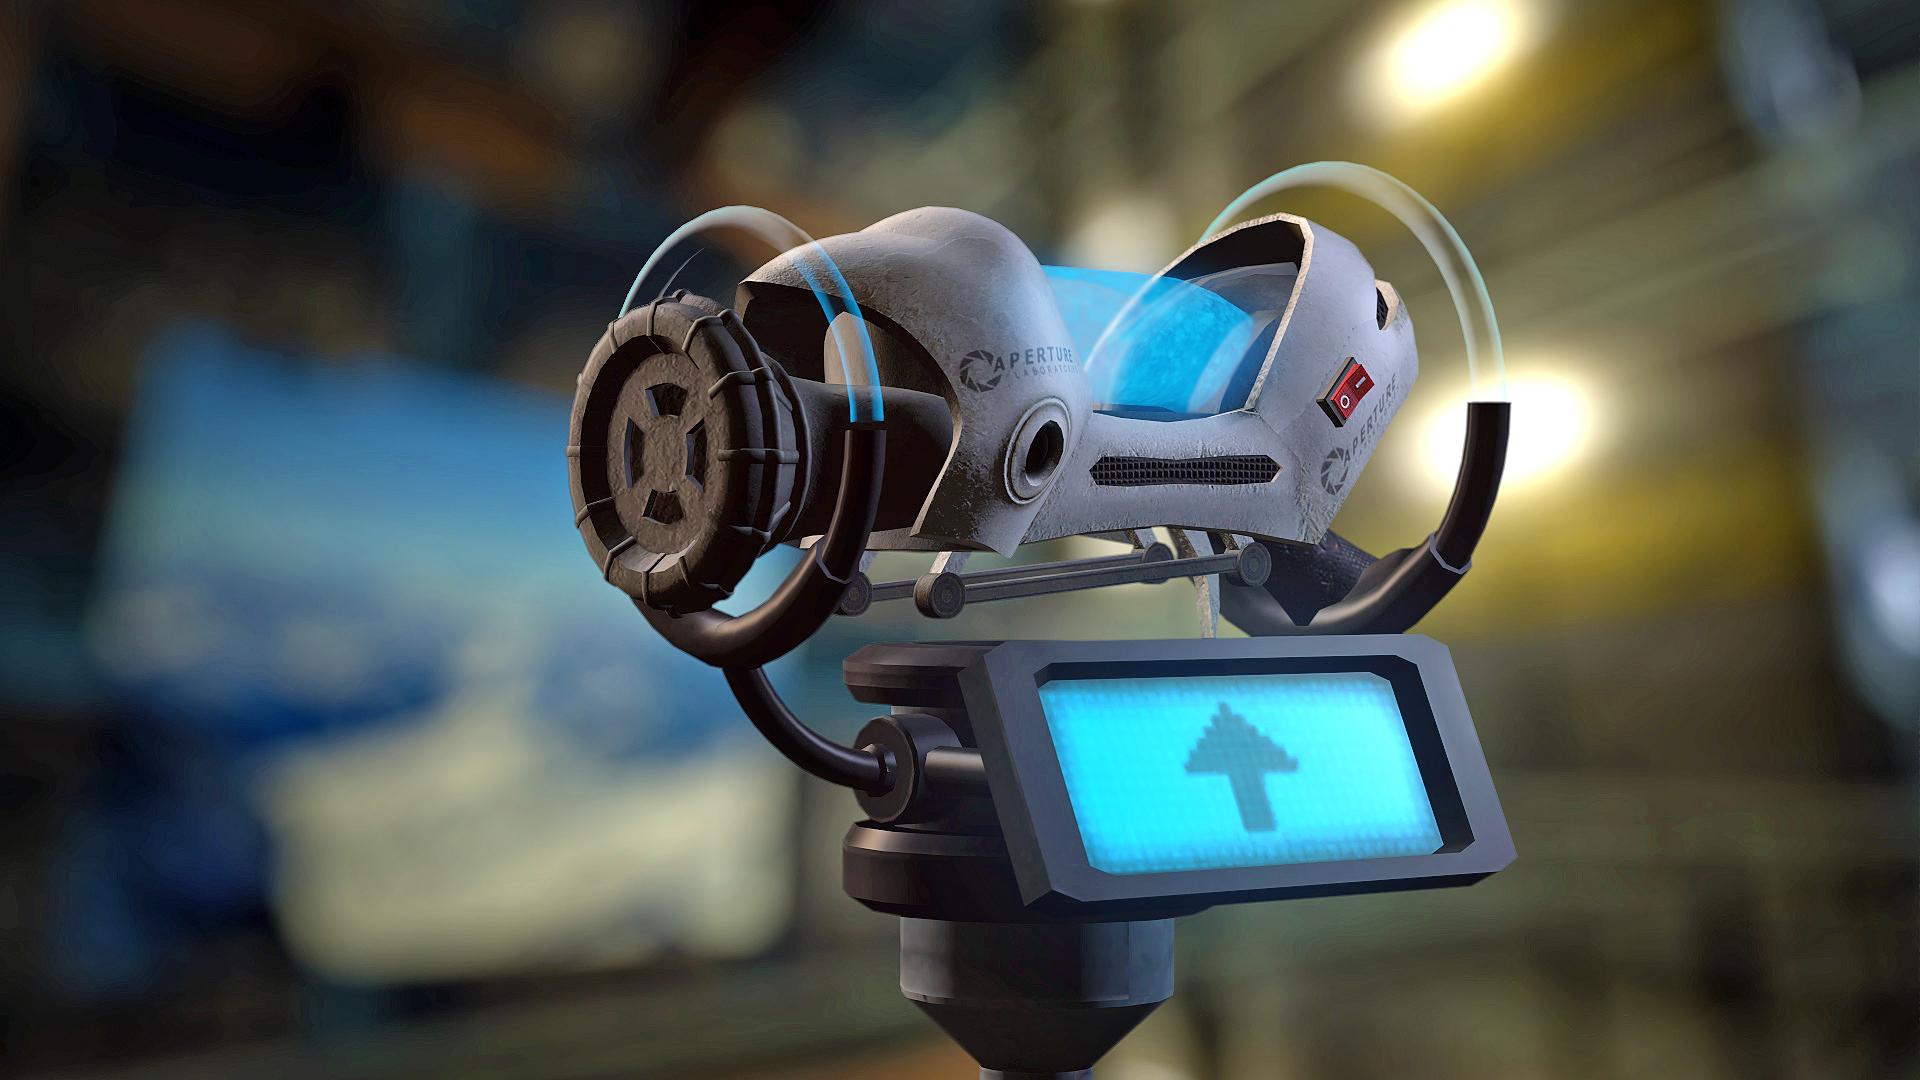 Portal 2 Mod - Aperture Tag The Paint Gun Testing Initiative - Die Gel-Kanone